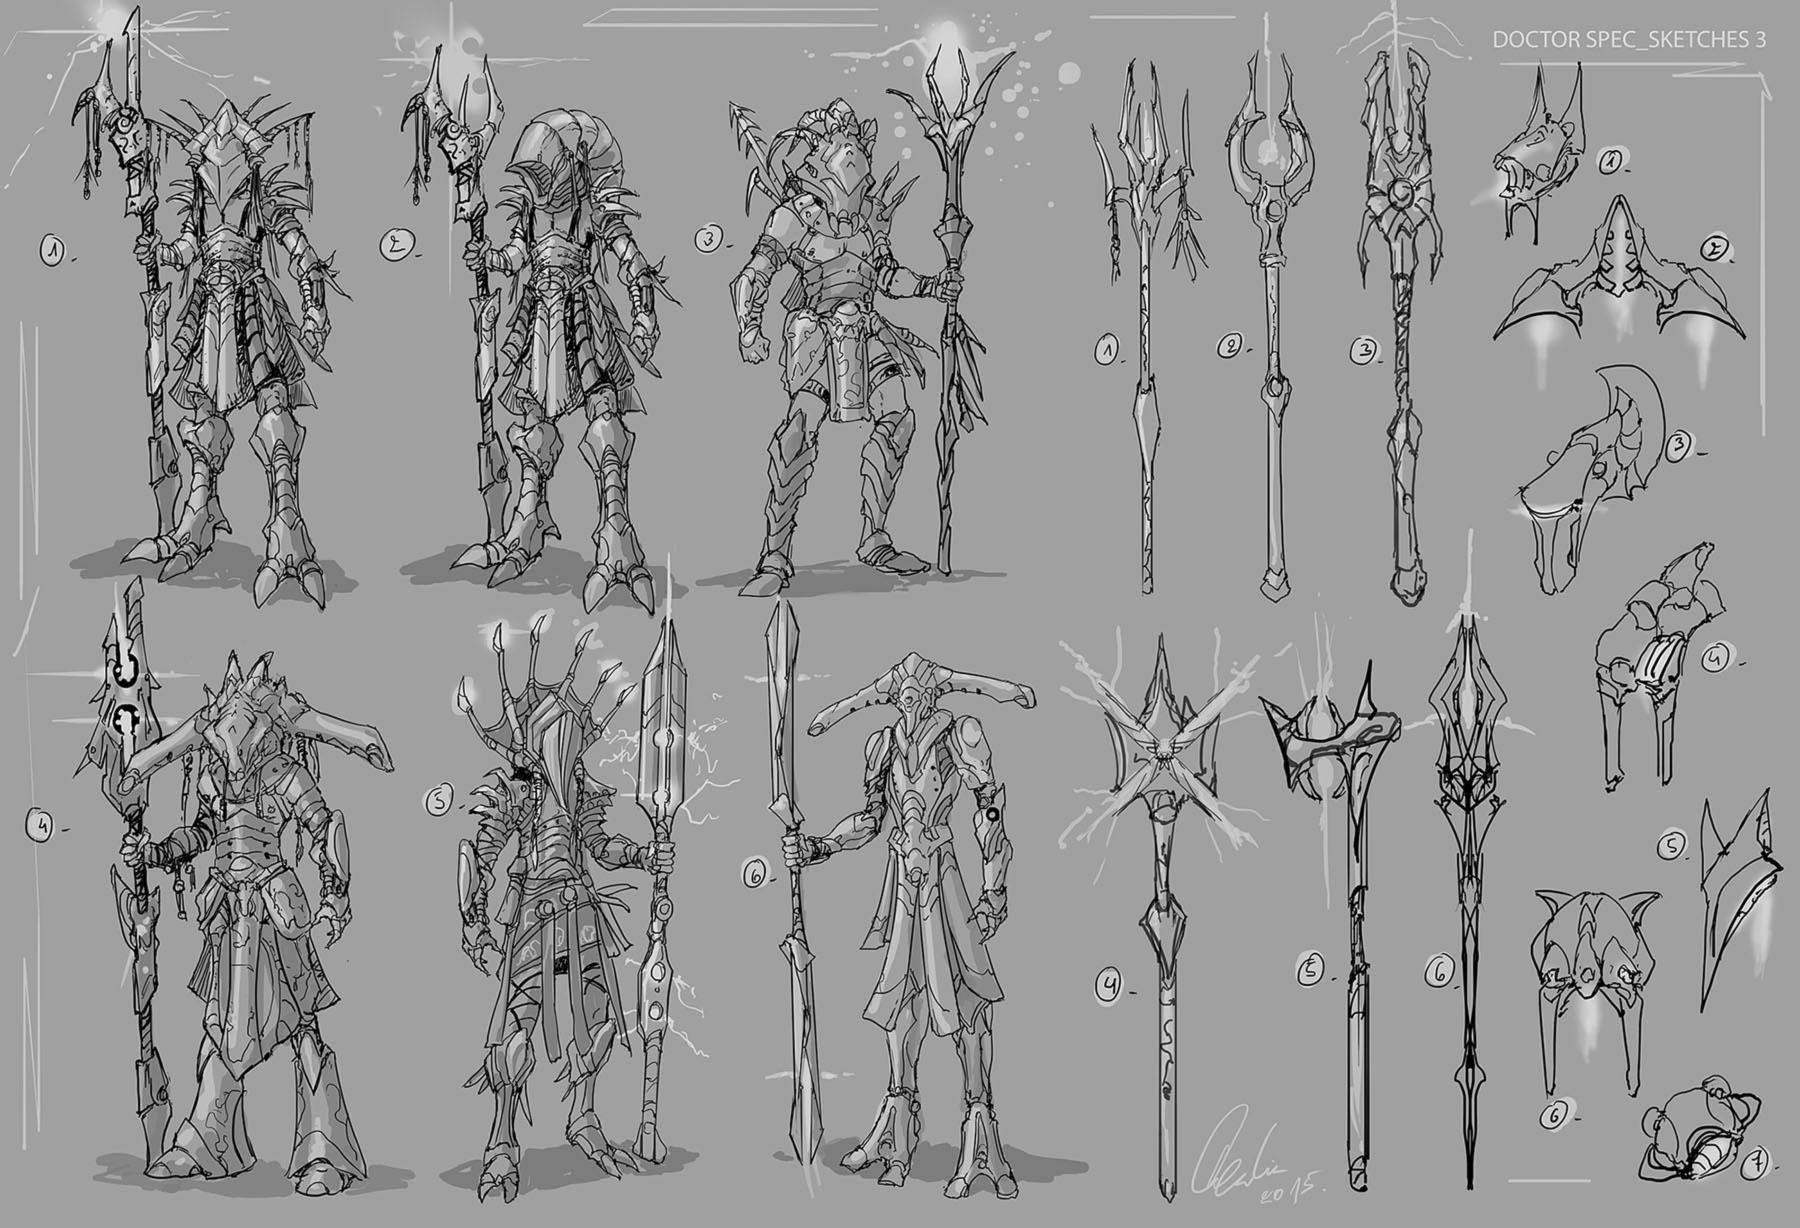 doctor_sketches3.jpg